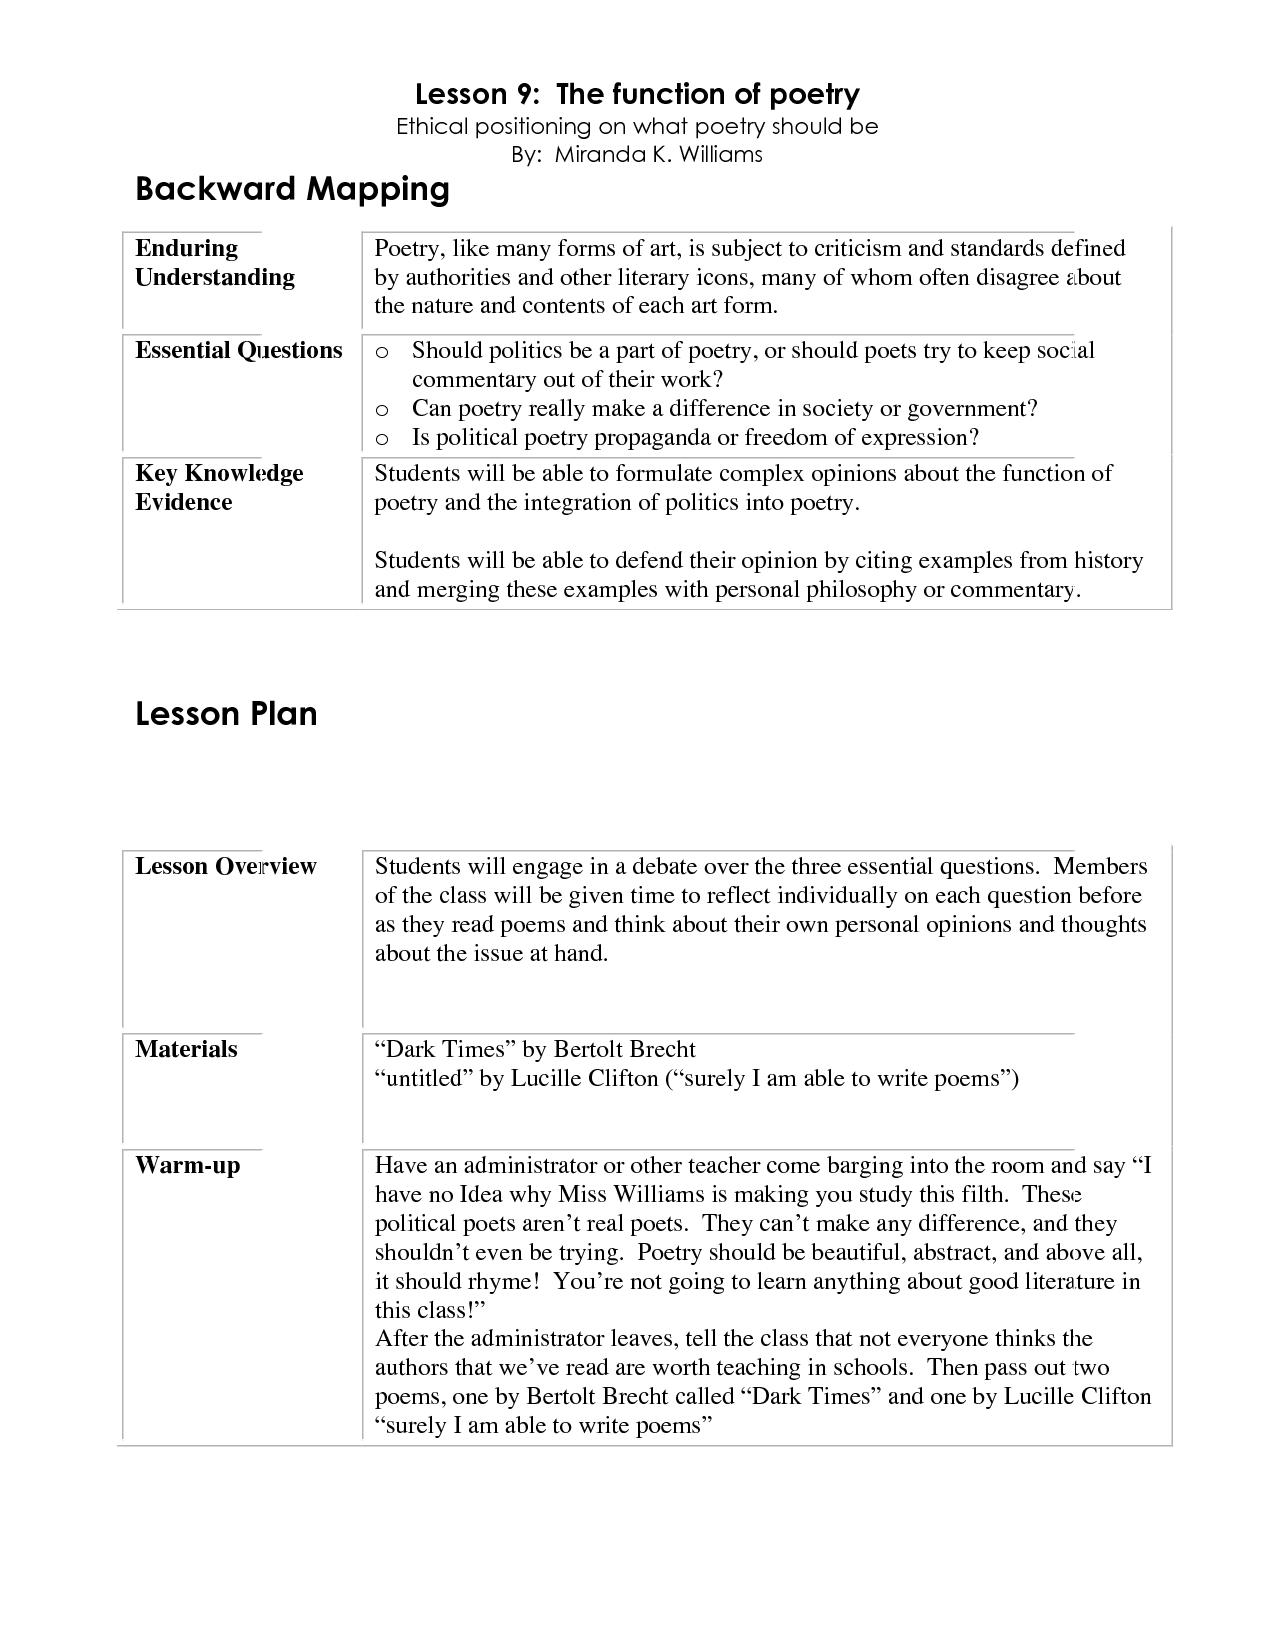 Backward Planning Template